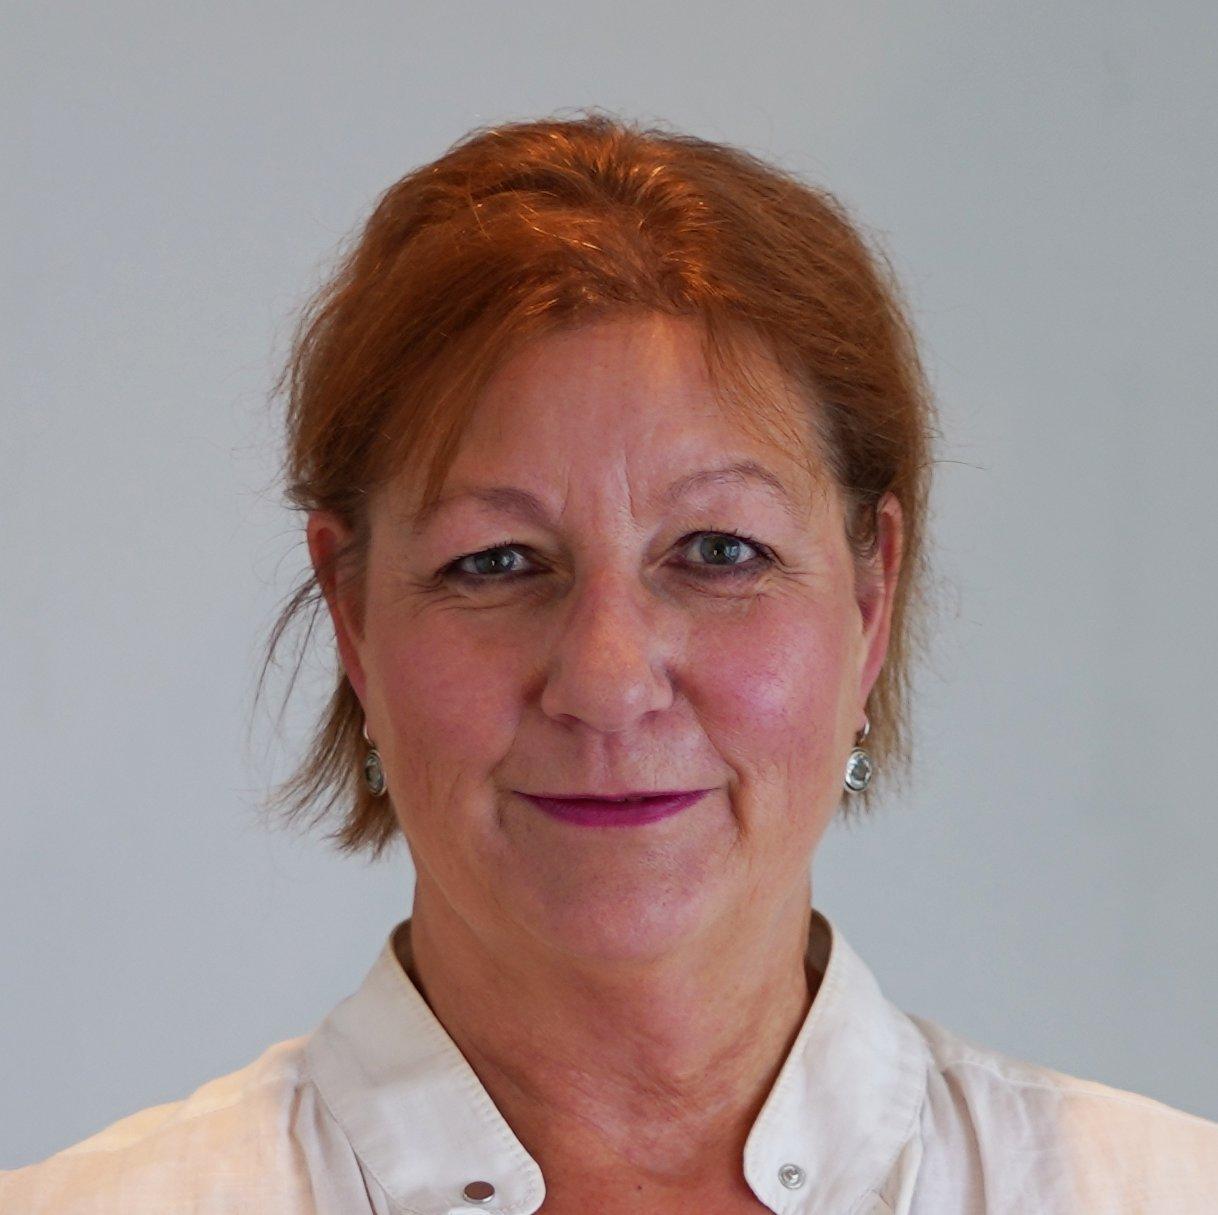 Maria-Theresia Wolff